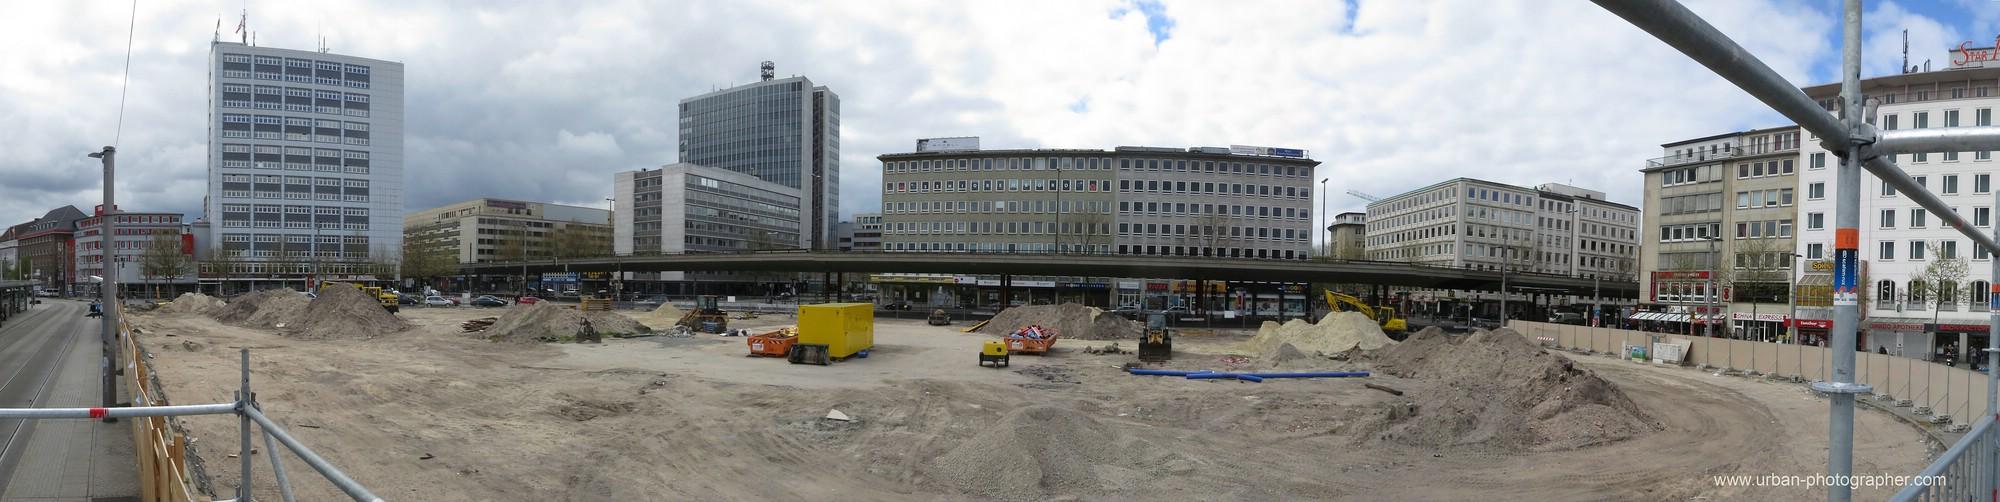 Baustelle Bahnhofsplatz 3